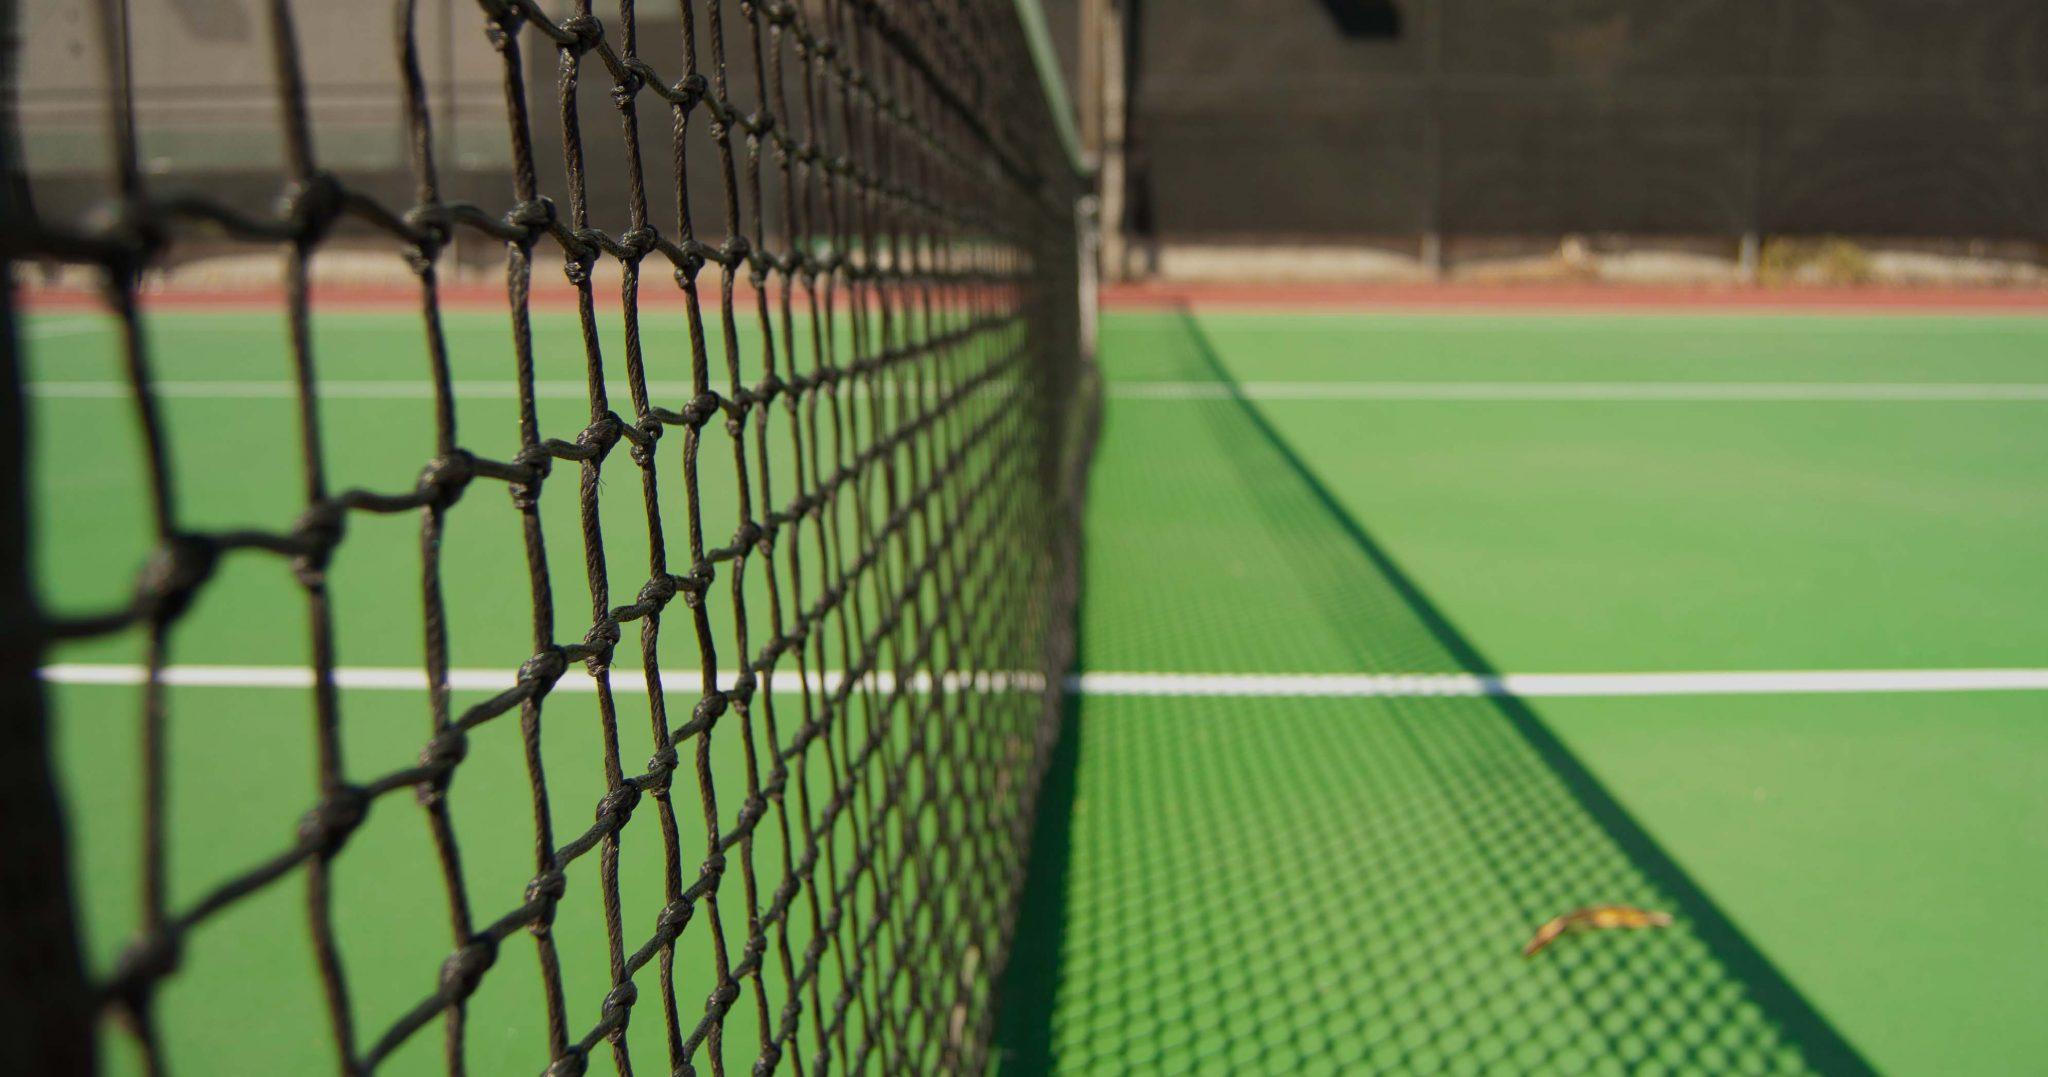 buy tennis club equipment online